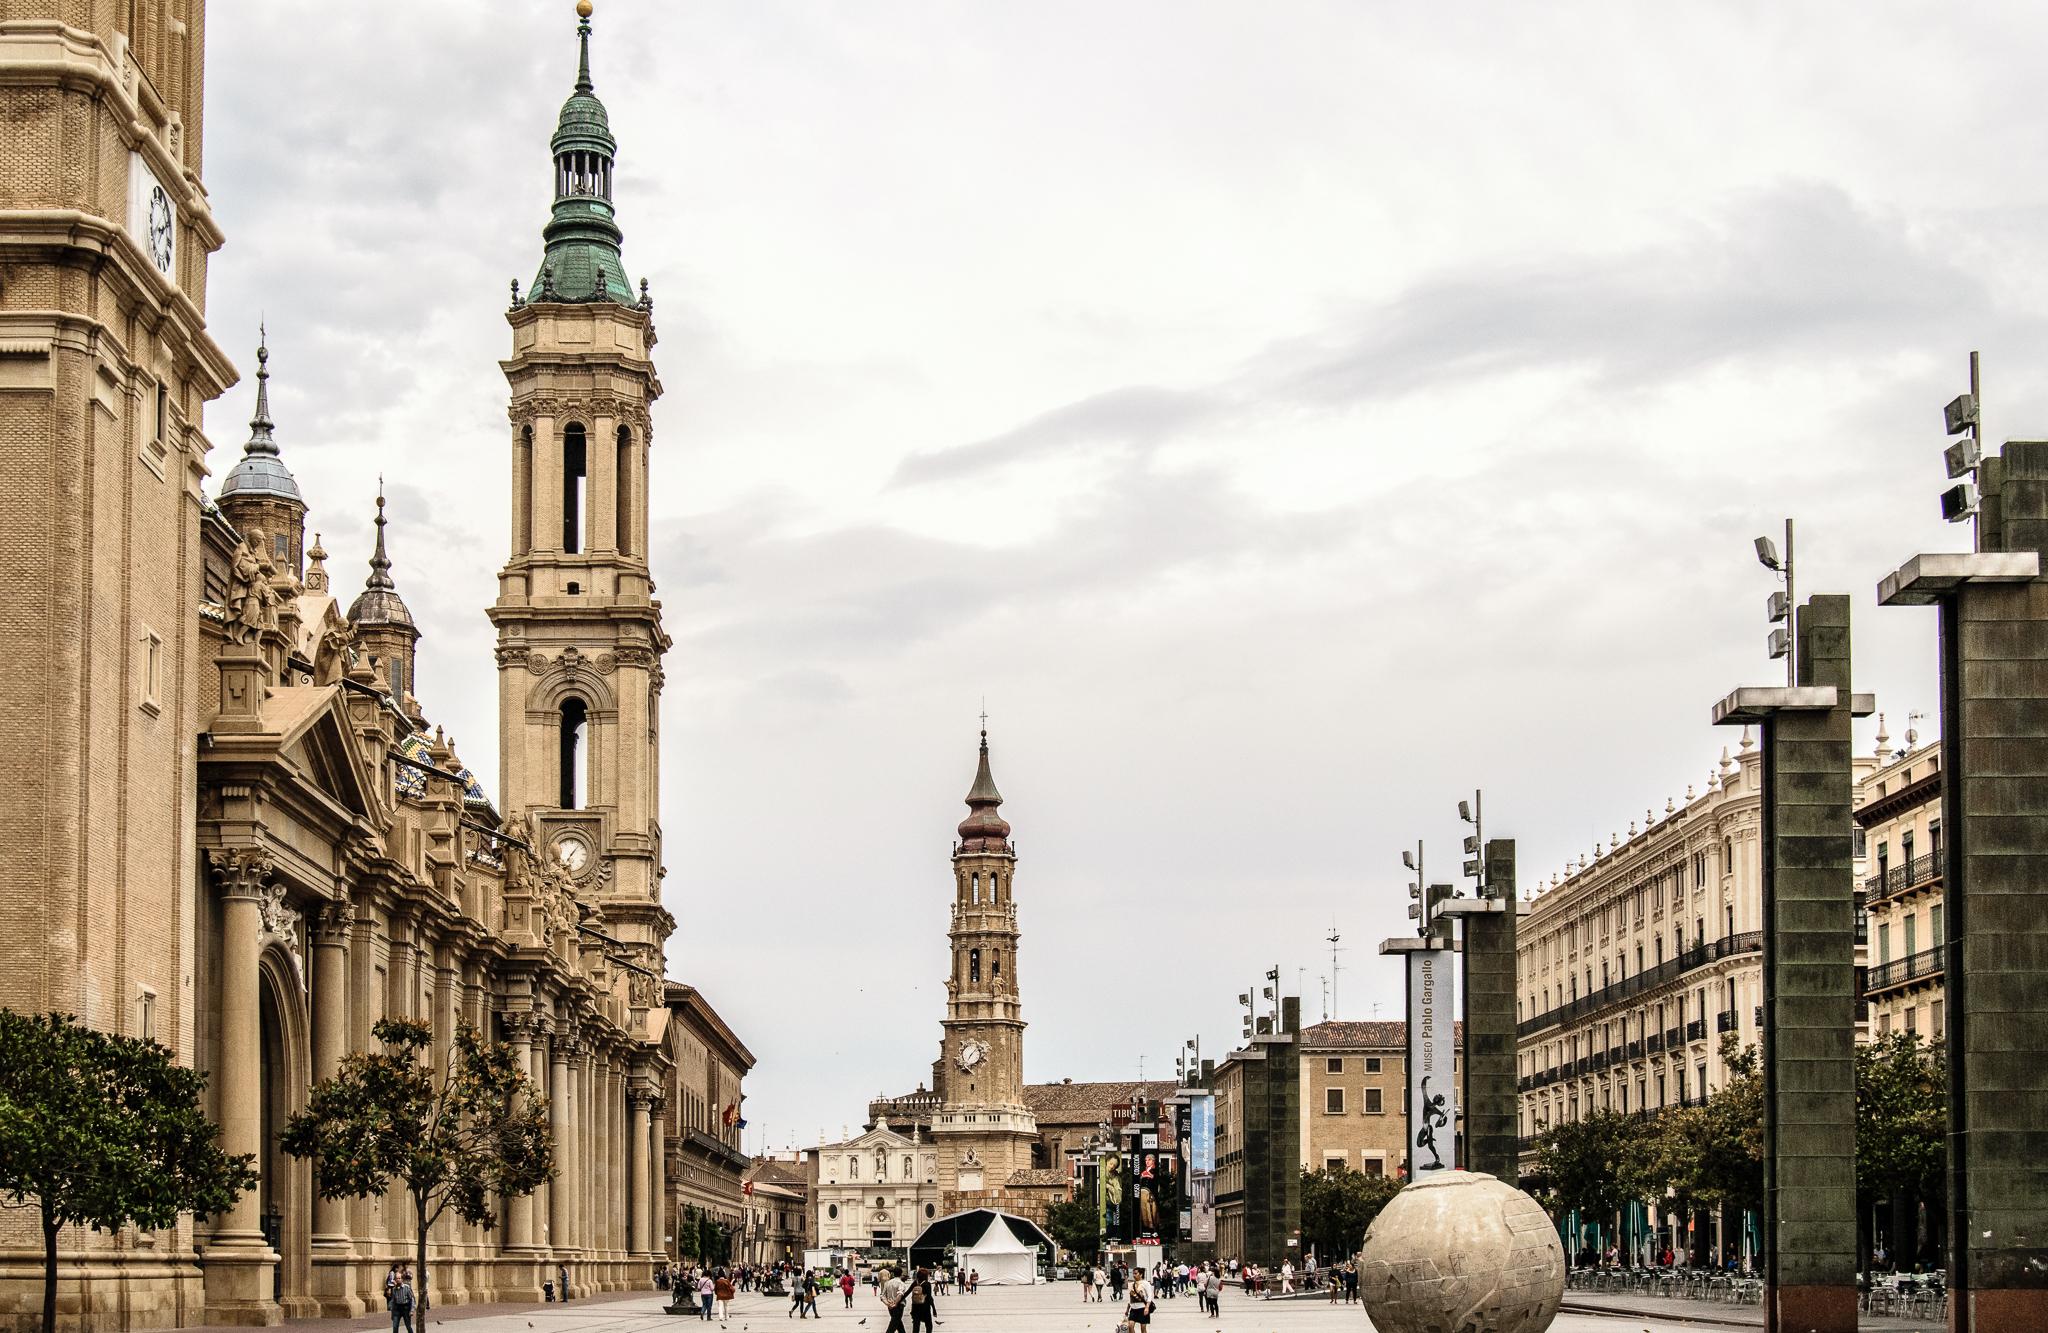 Plaza del Pilar